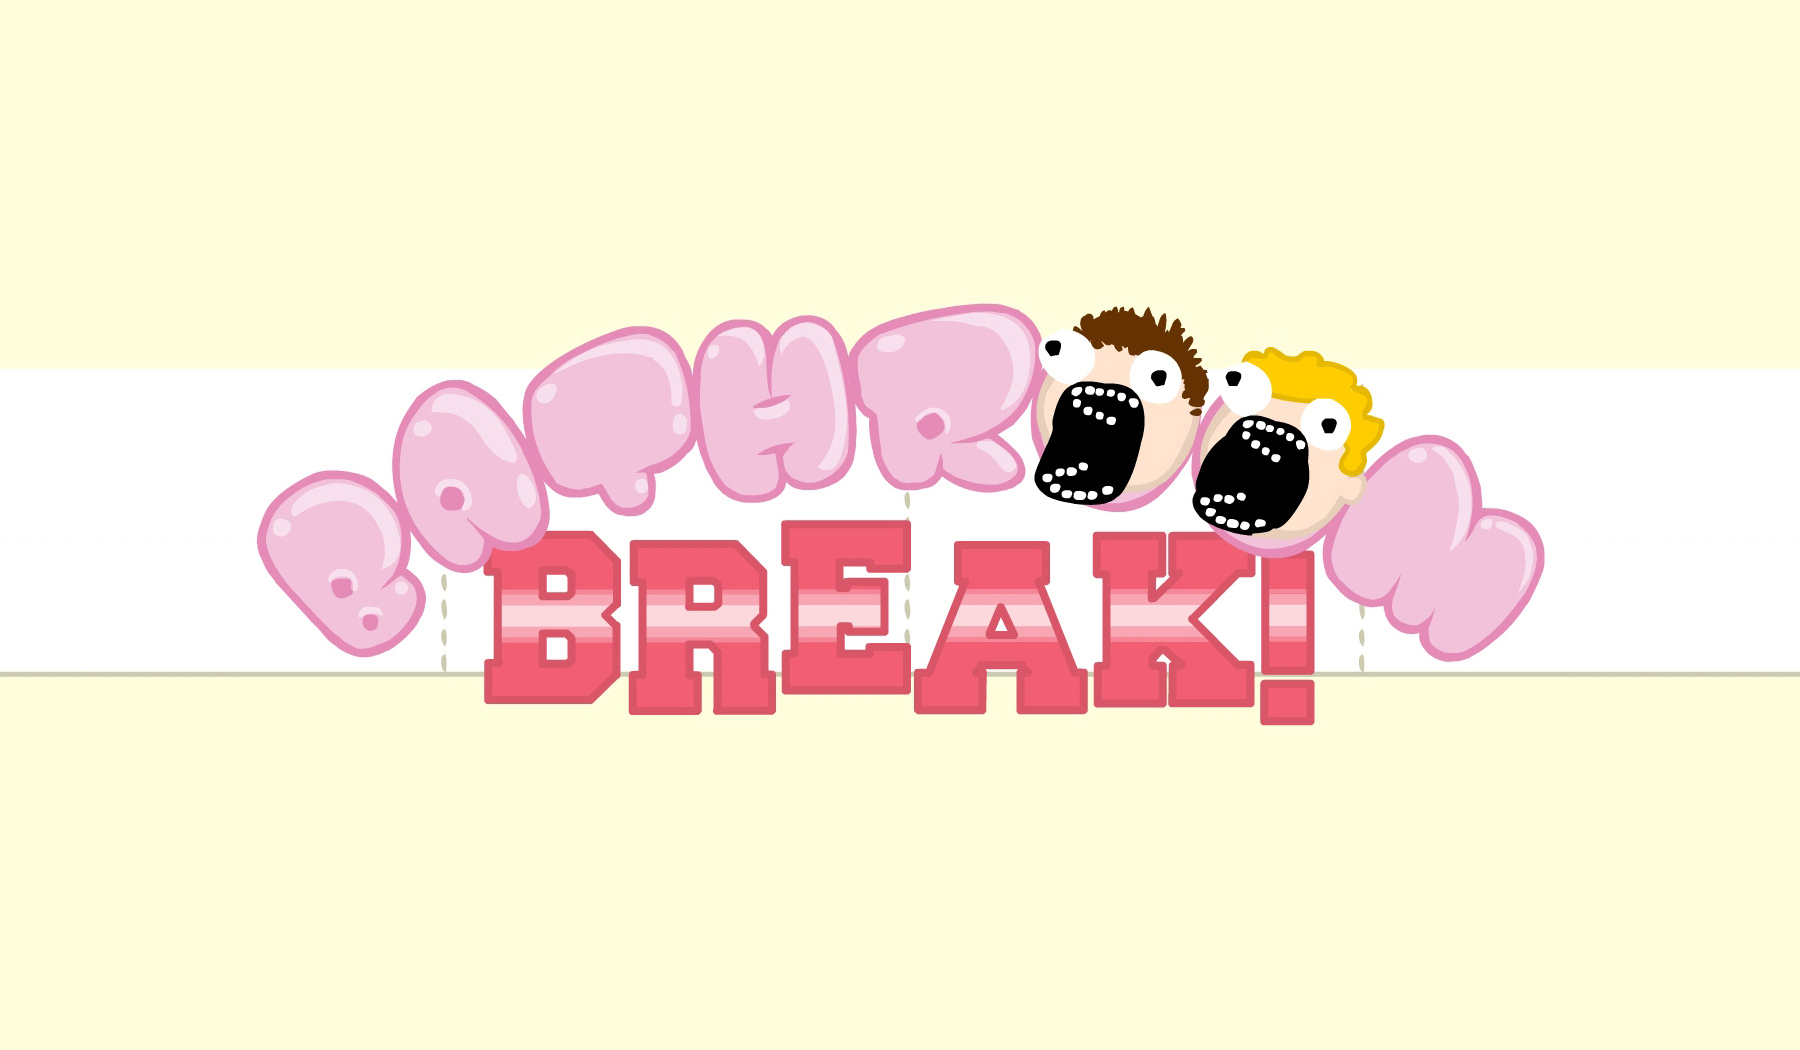 Bathroom Break!